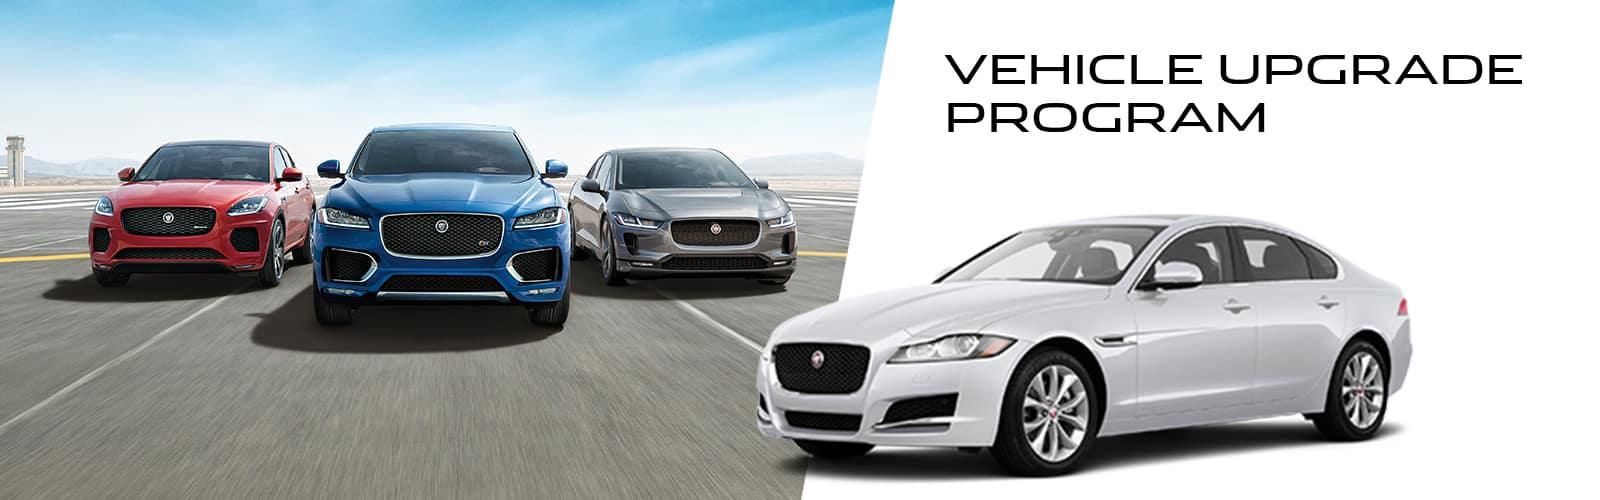 Jaguar Vehicle Upgrade Program